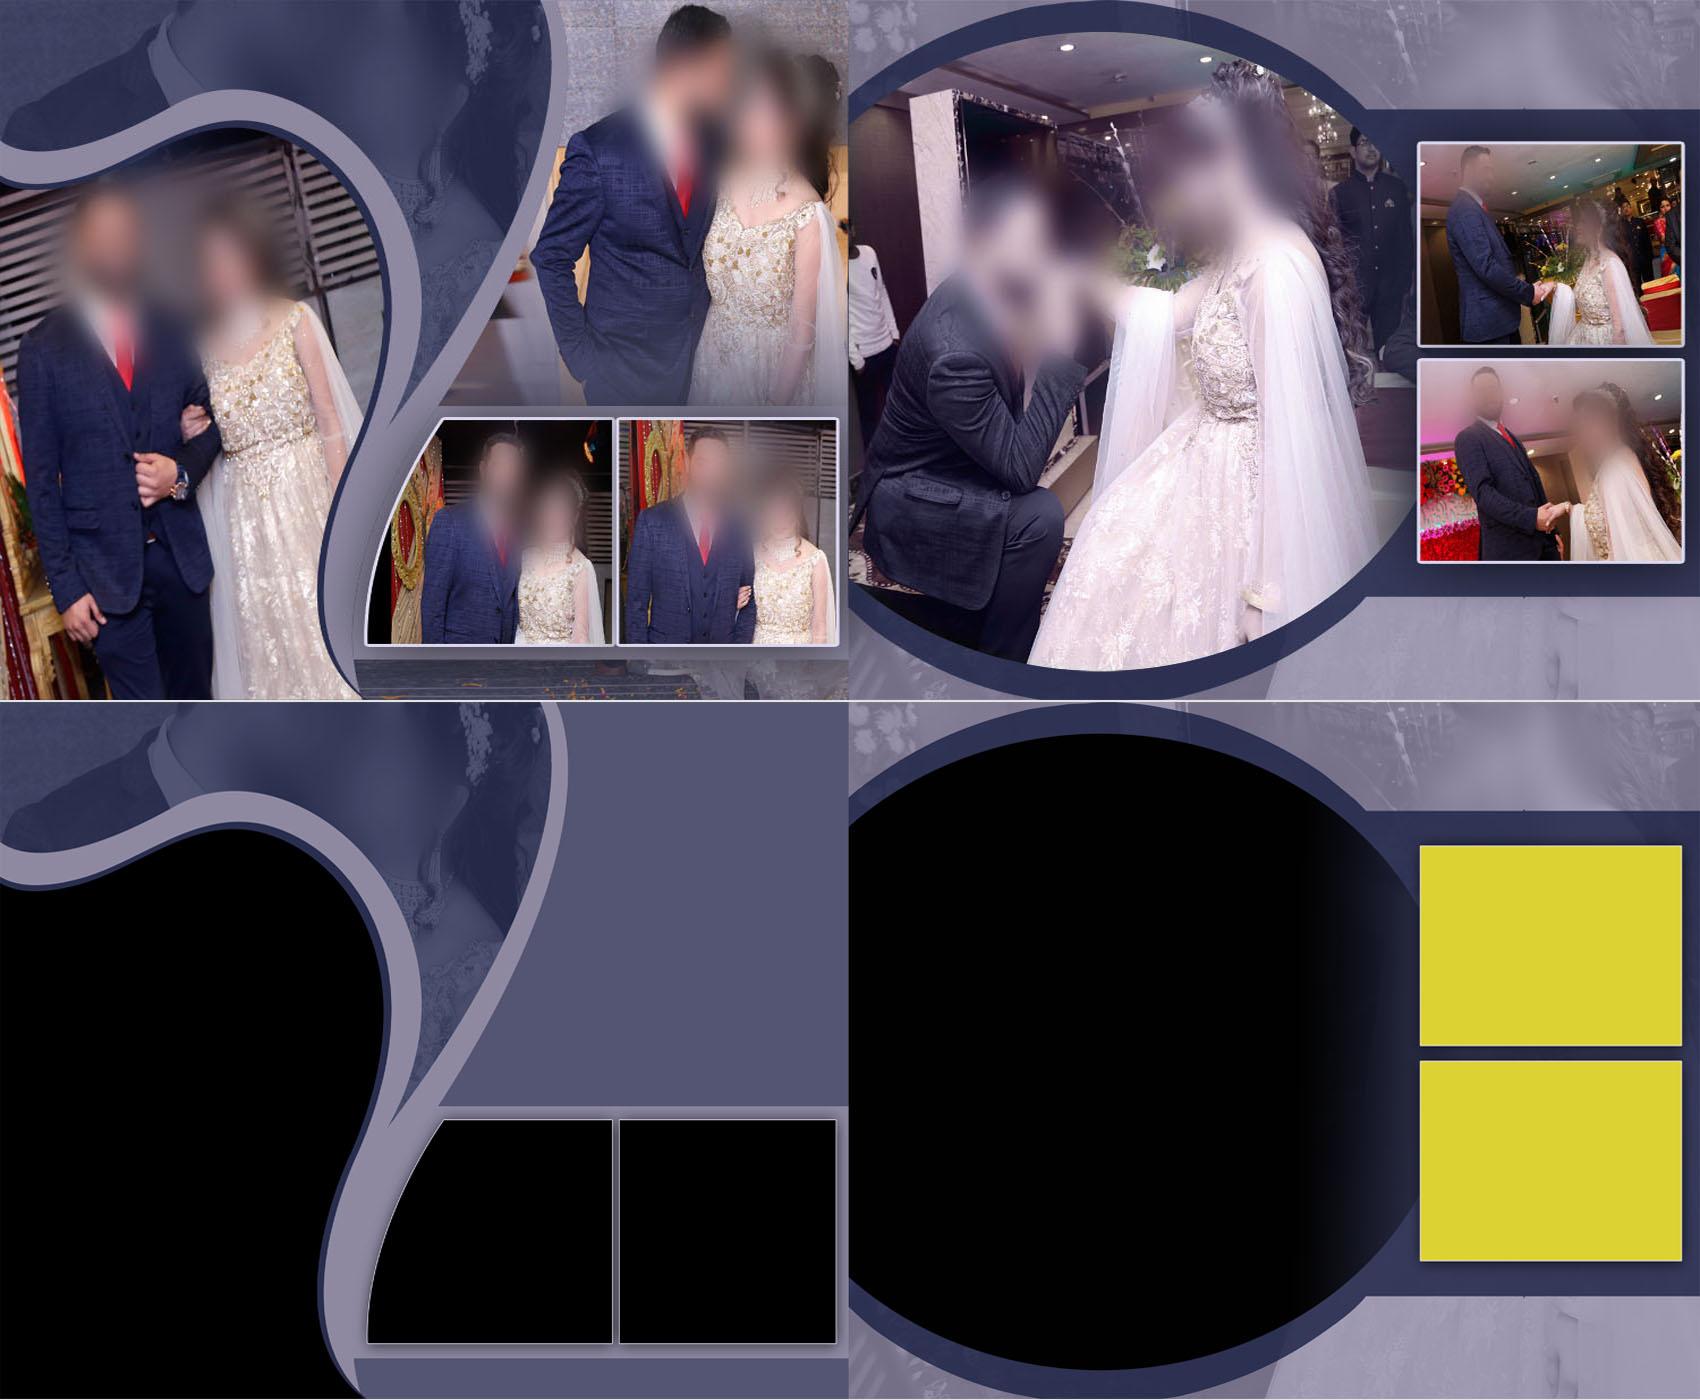 Wedding Album Background Images Free Download 50016 Lavanya Fabric Design